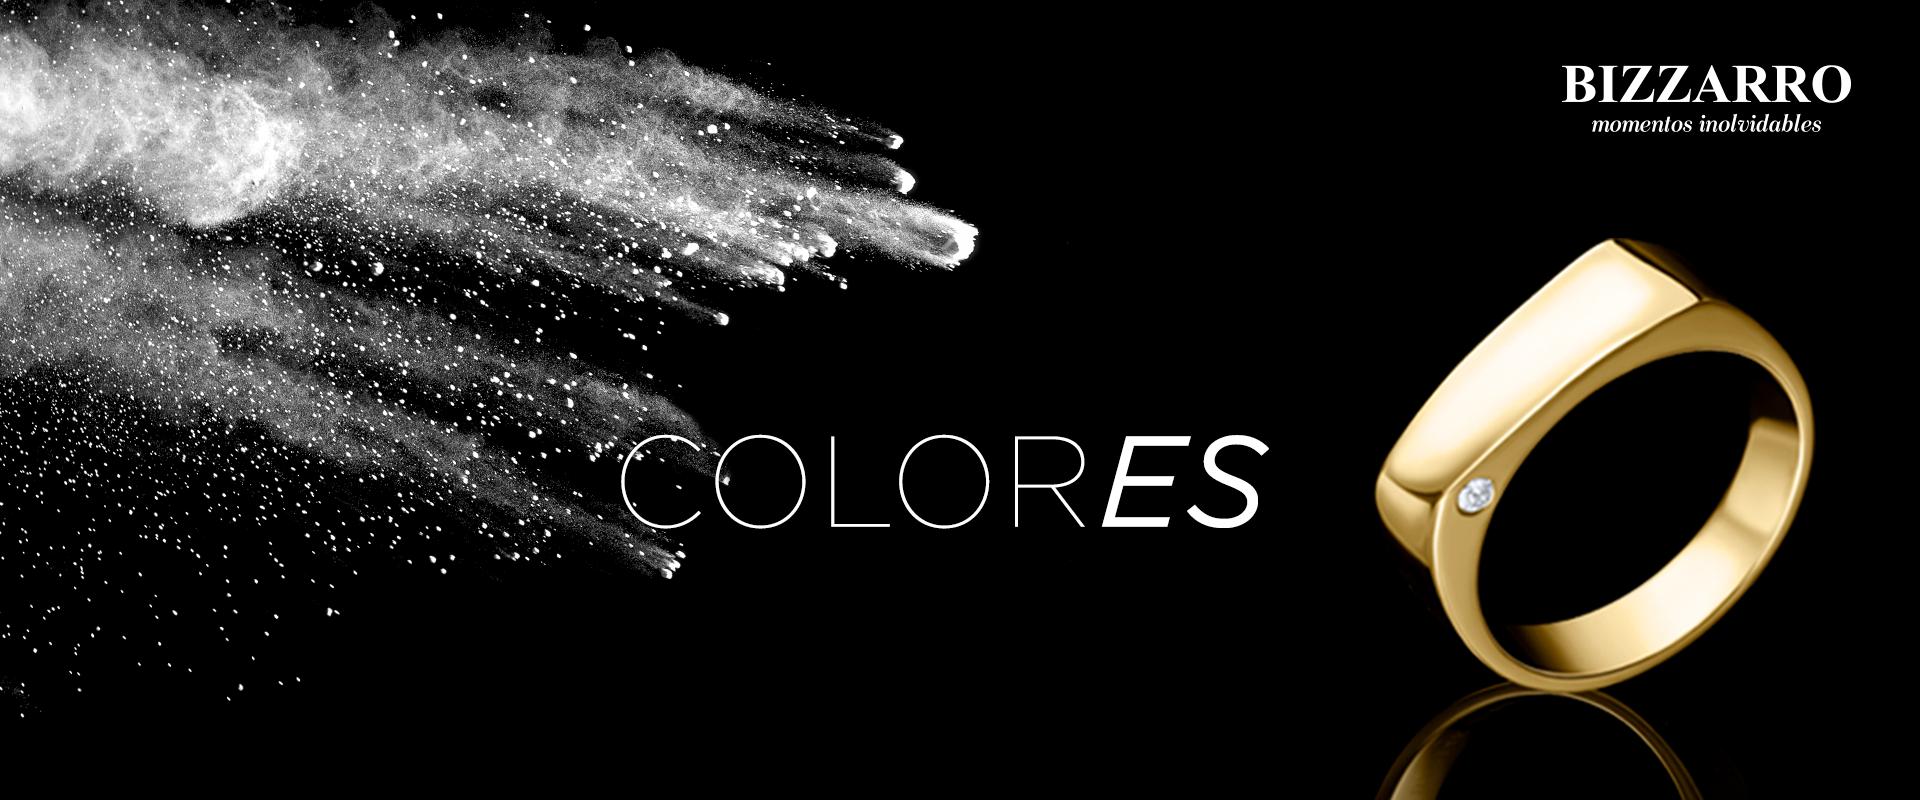 ColorES, un amor universal